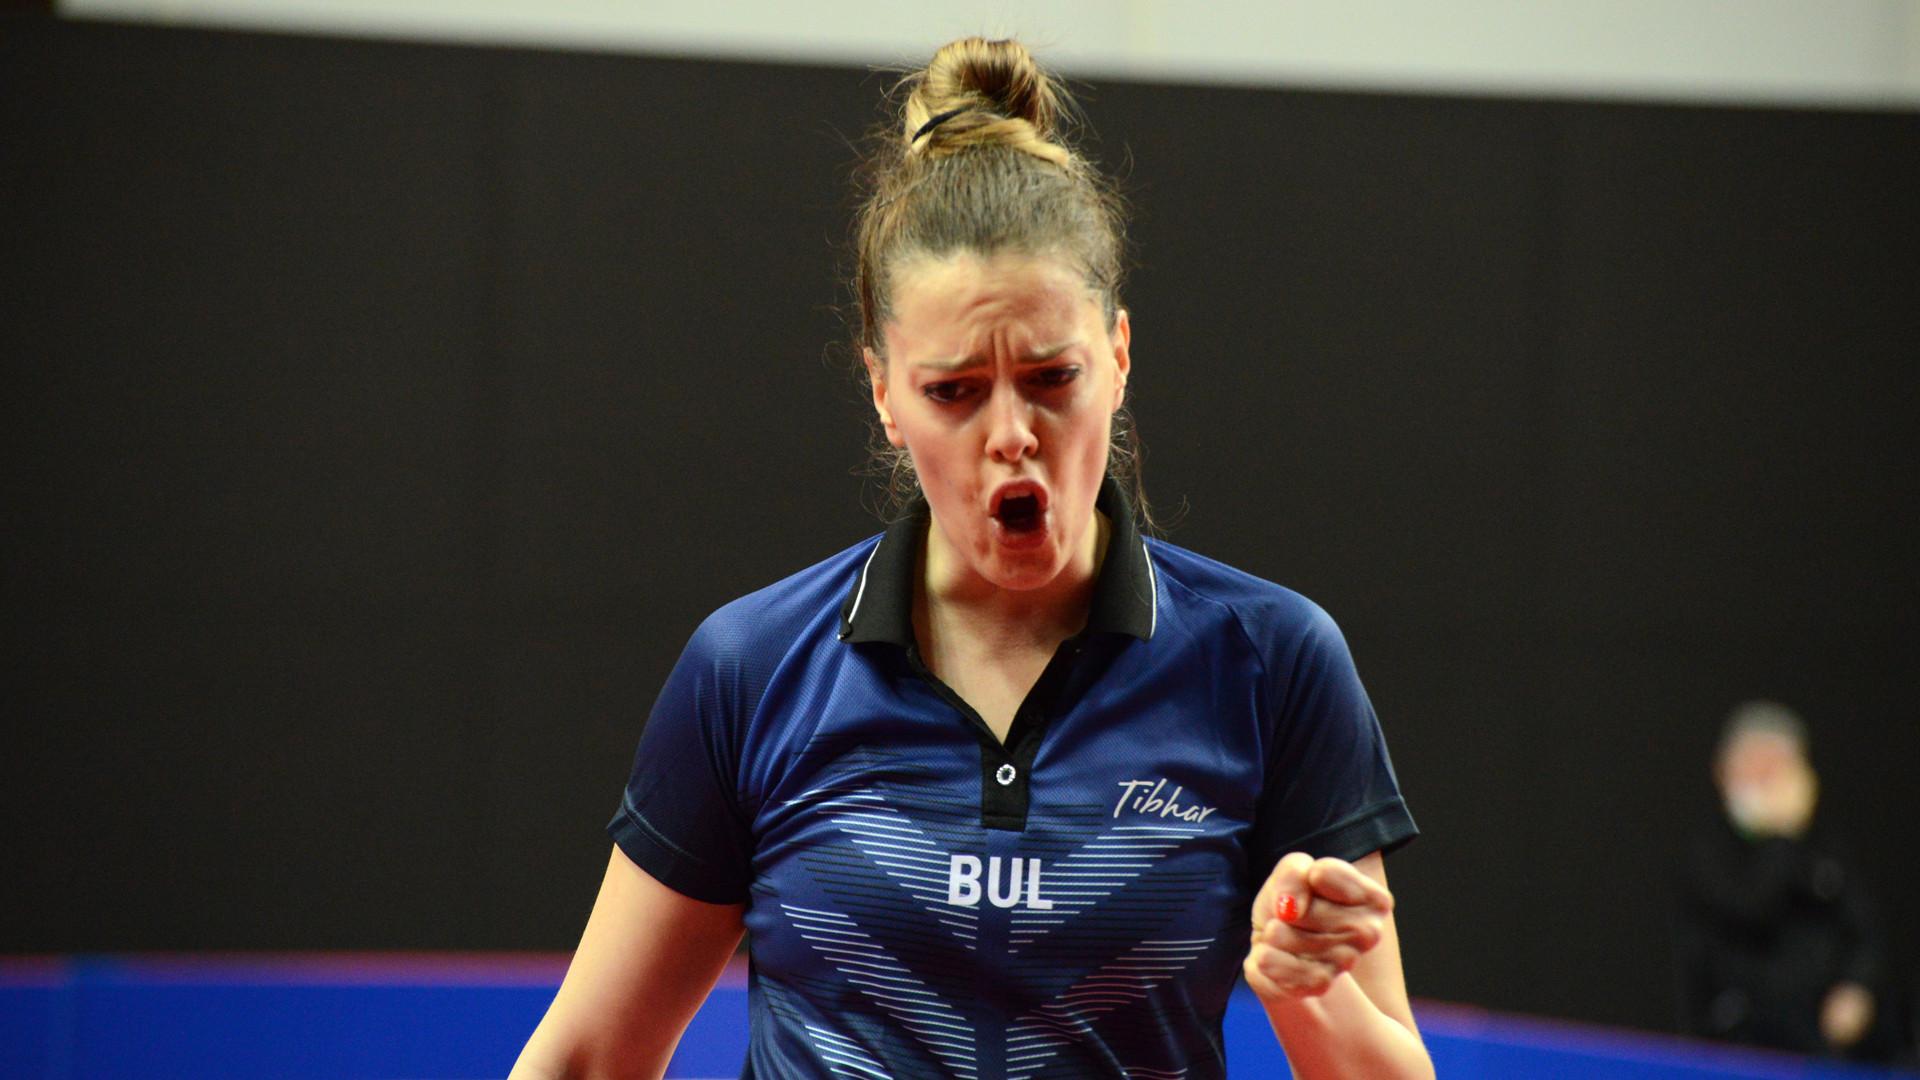 Trifona's surprise win keeps Tokyo 2020 dreams alive at ITTF European Qualifier